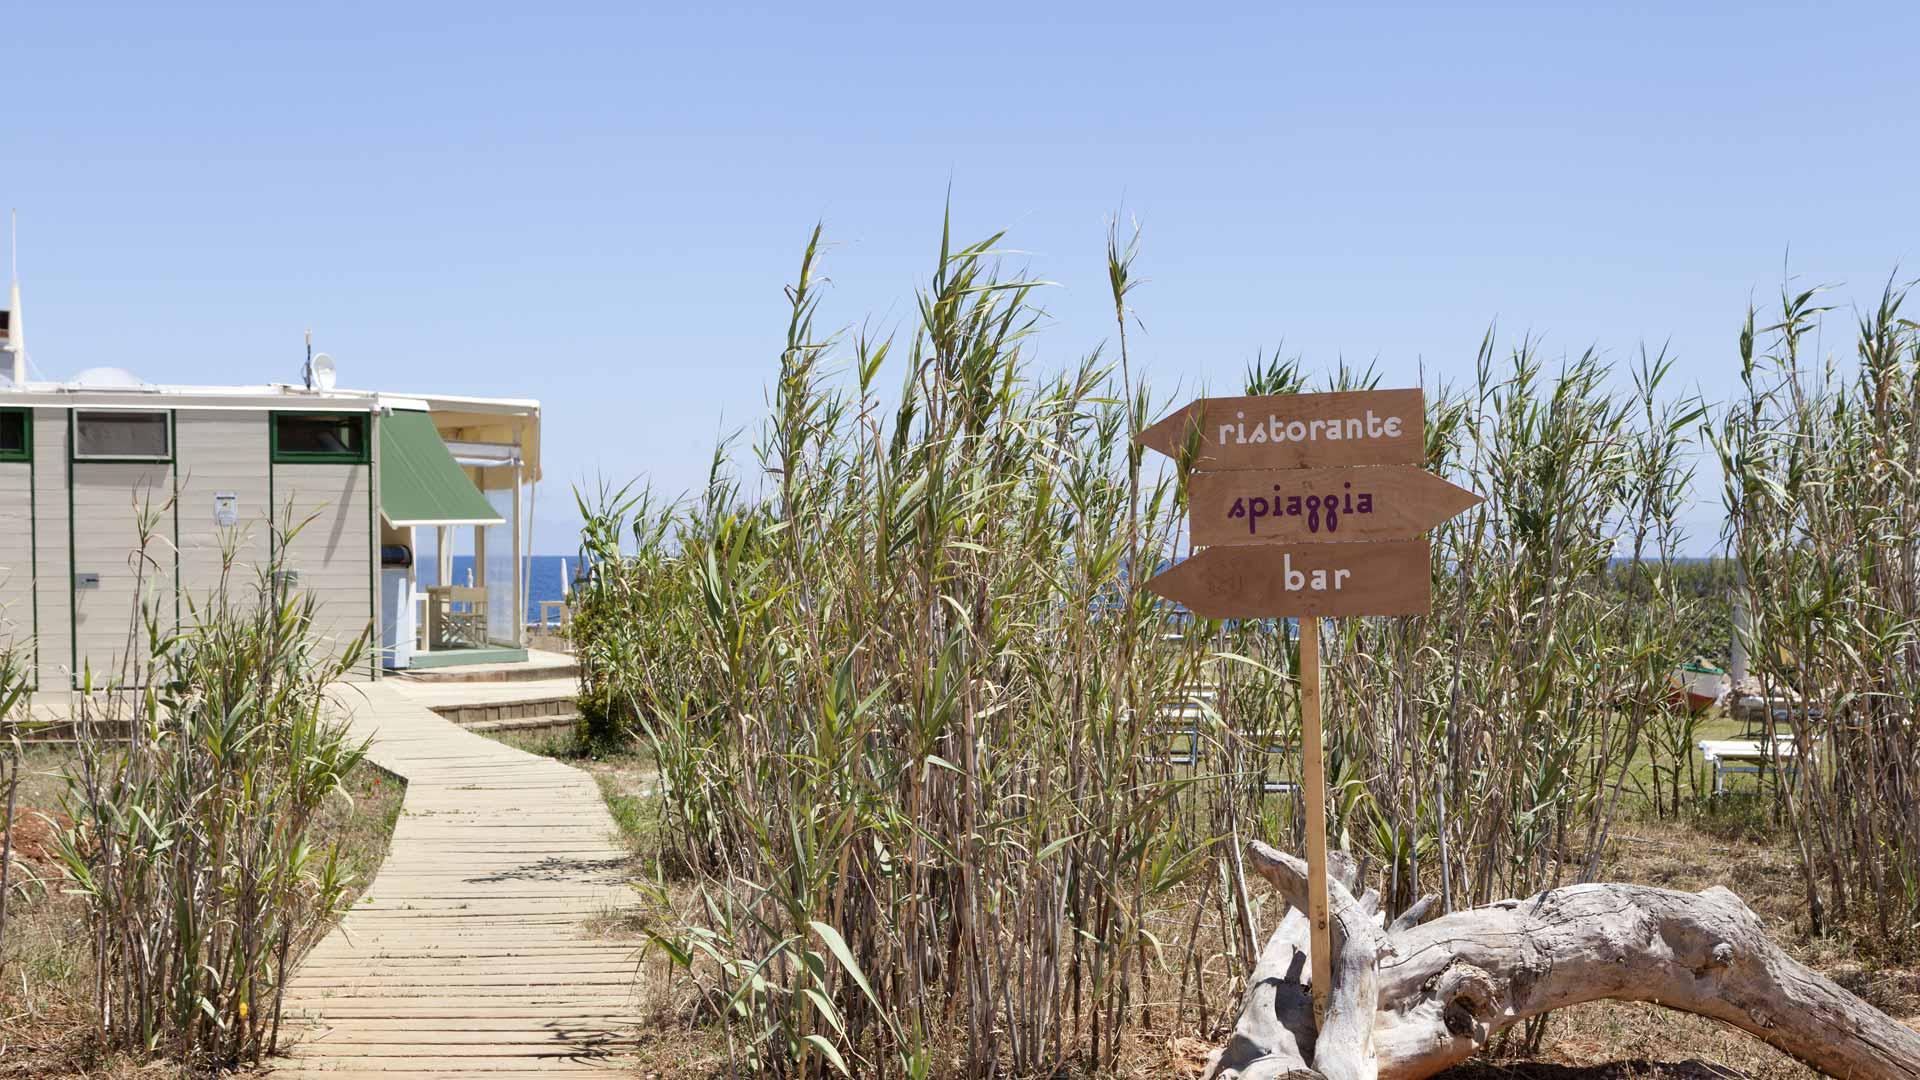 Spiaggia Marzà